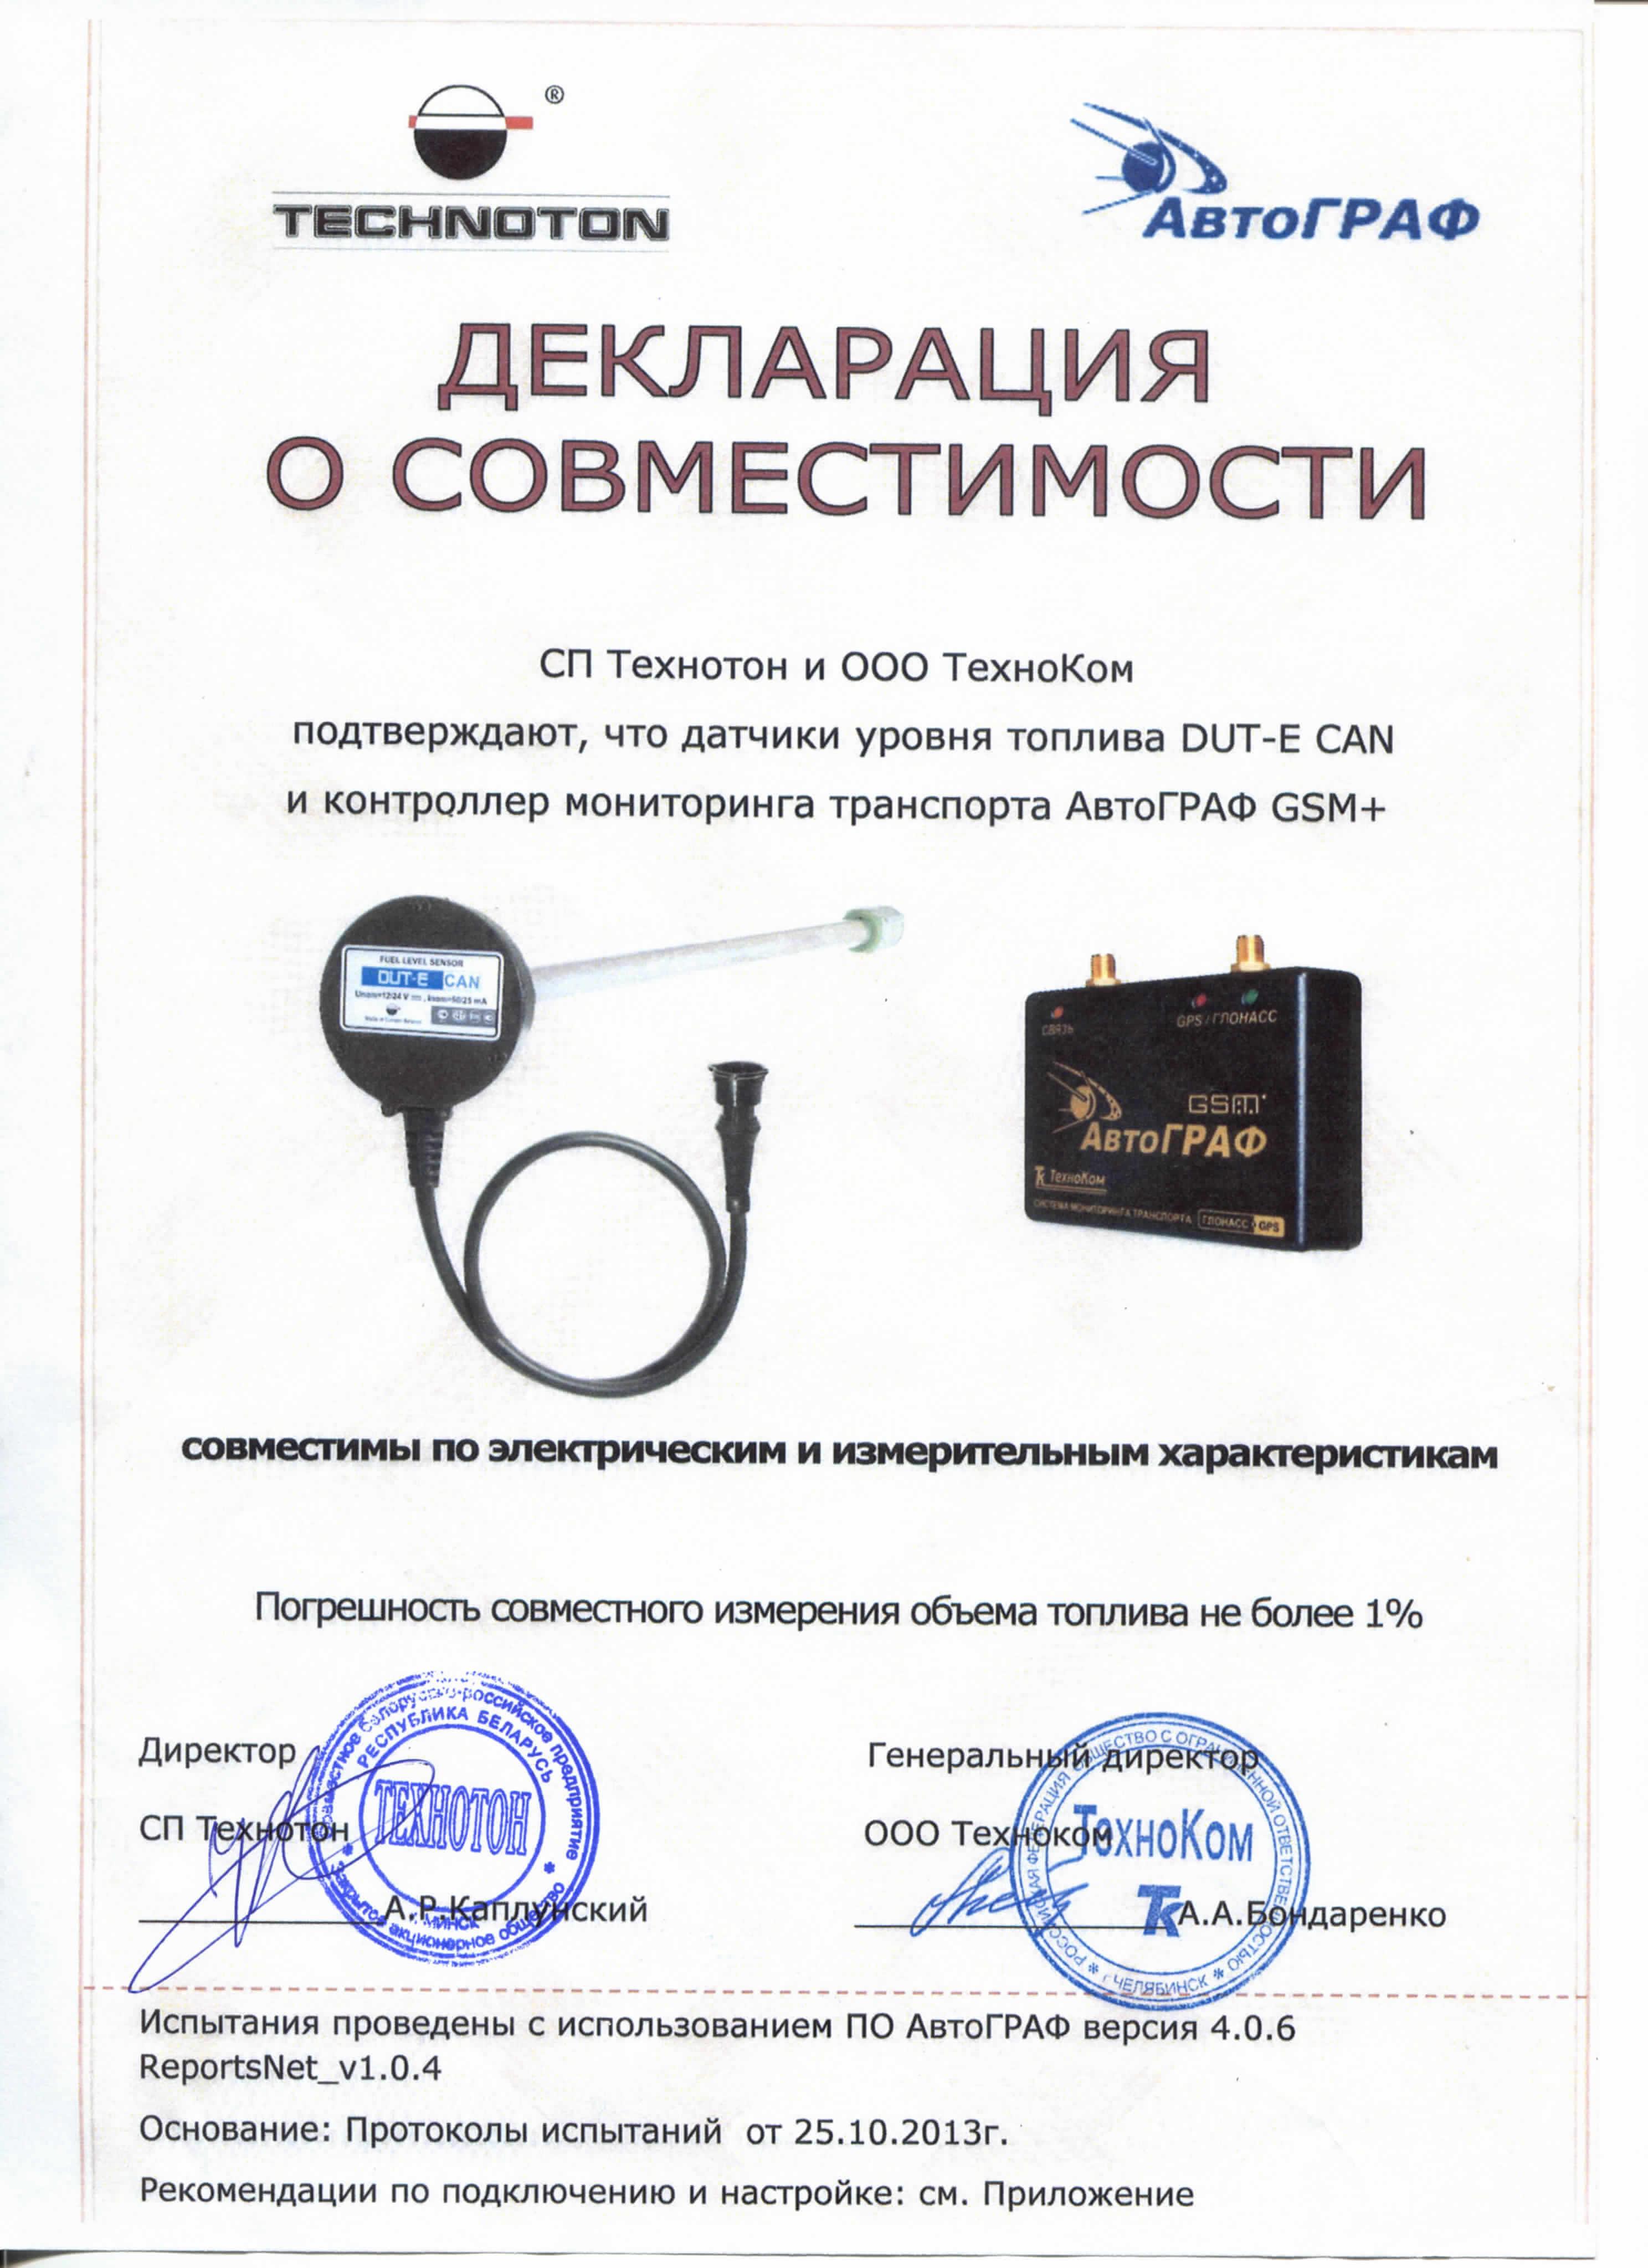 DUT-E CAN совместим с АвтоГРАФ GSM+